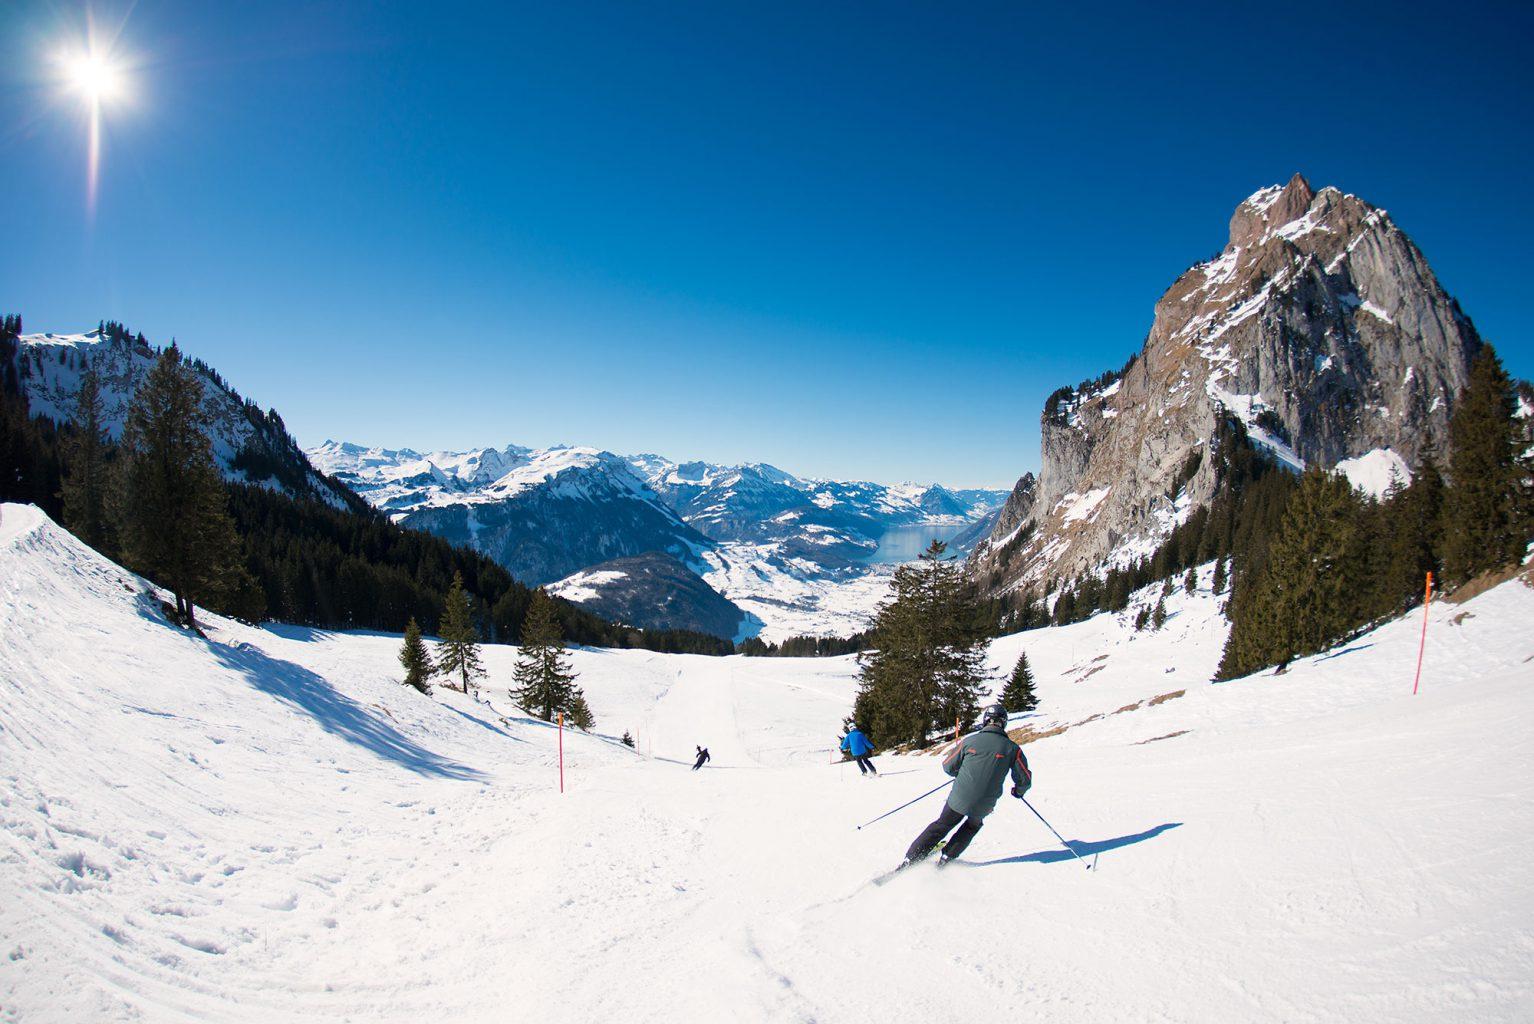 Mythen Region, Switzerland